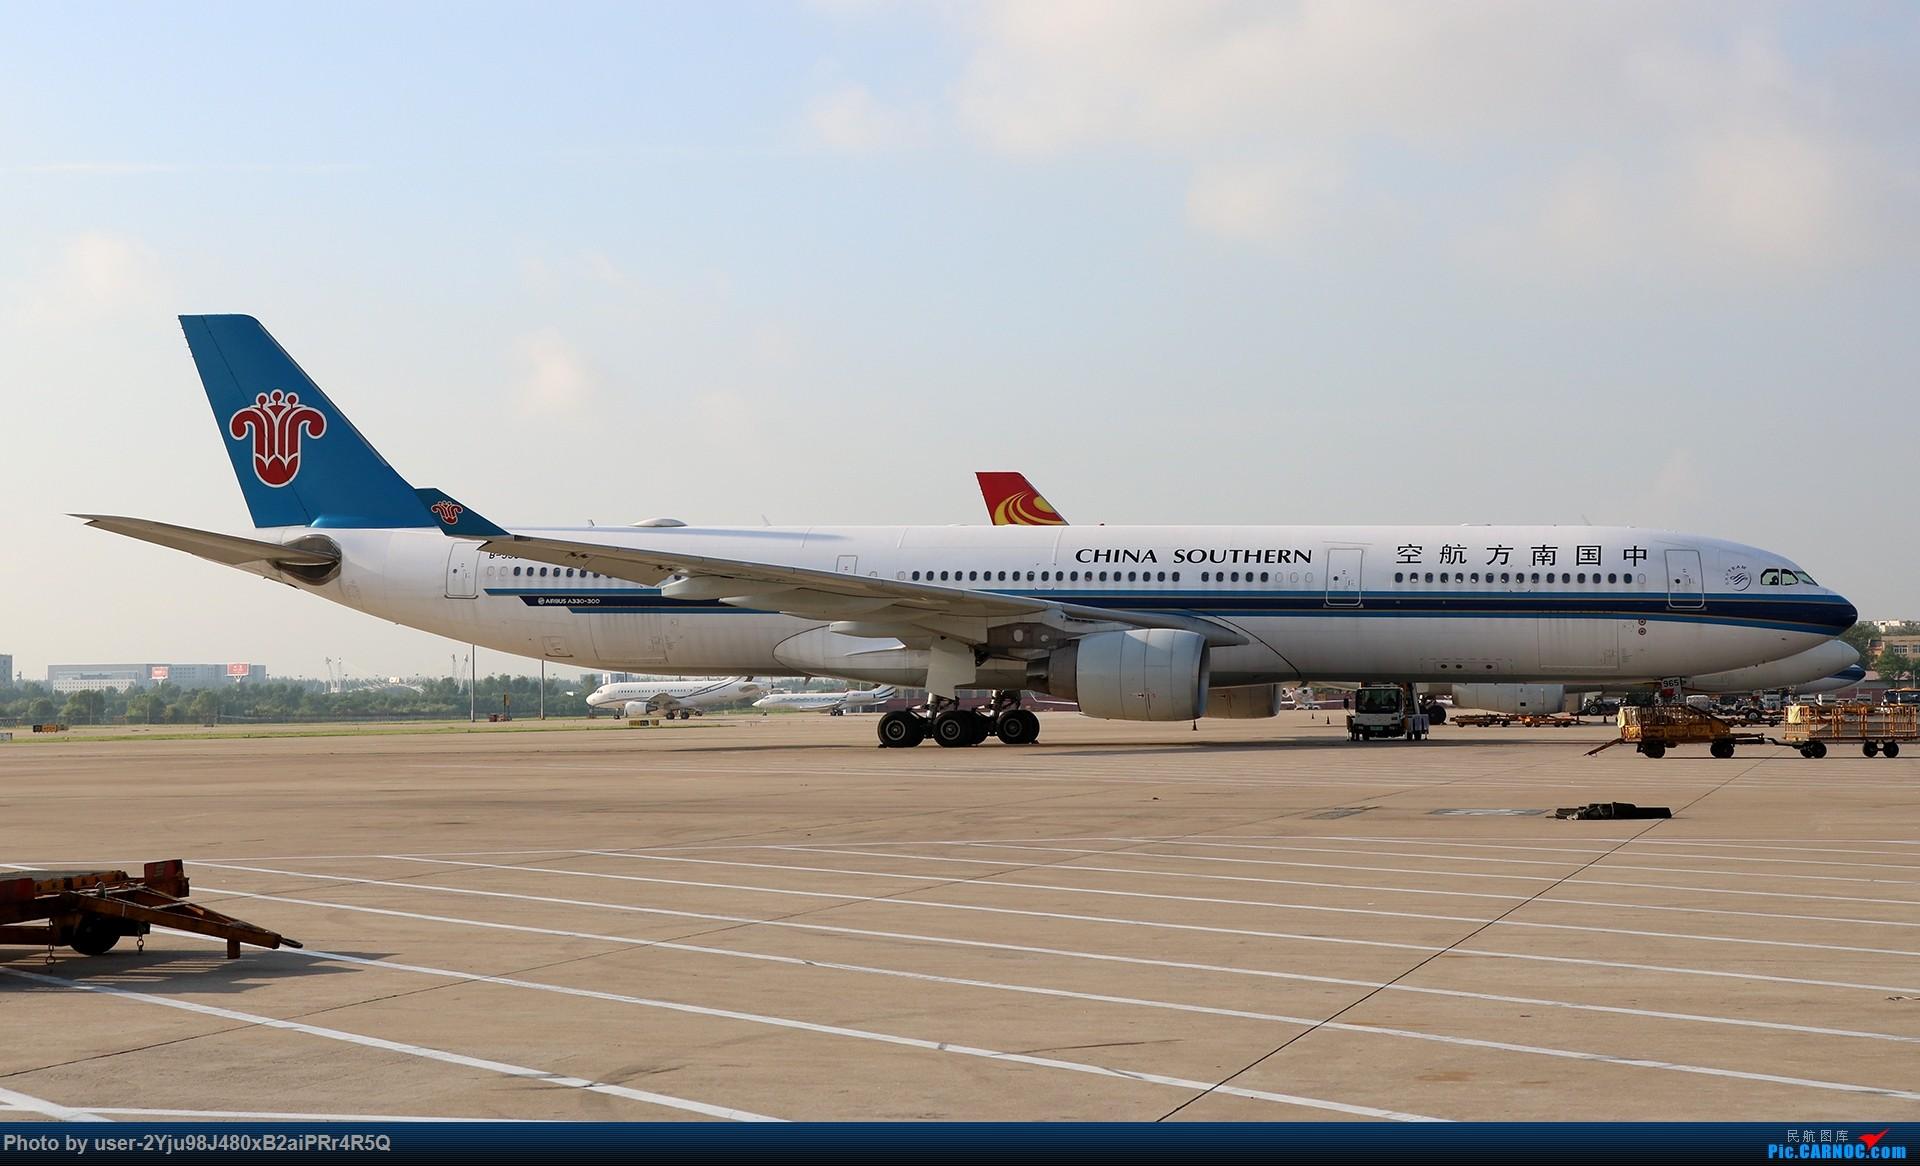 Re:[原创]LIULIU|一天两种机型三个国家四段航线五座城市的回家之路|西伯利亚上空的星光 AIRBUS A330-343 B-5965 中国北京首都国际机场